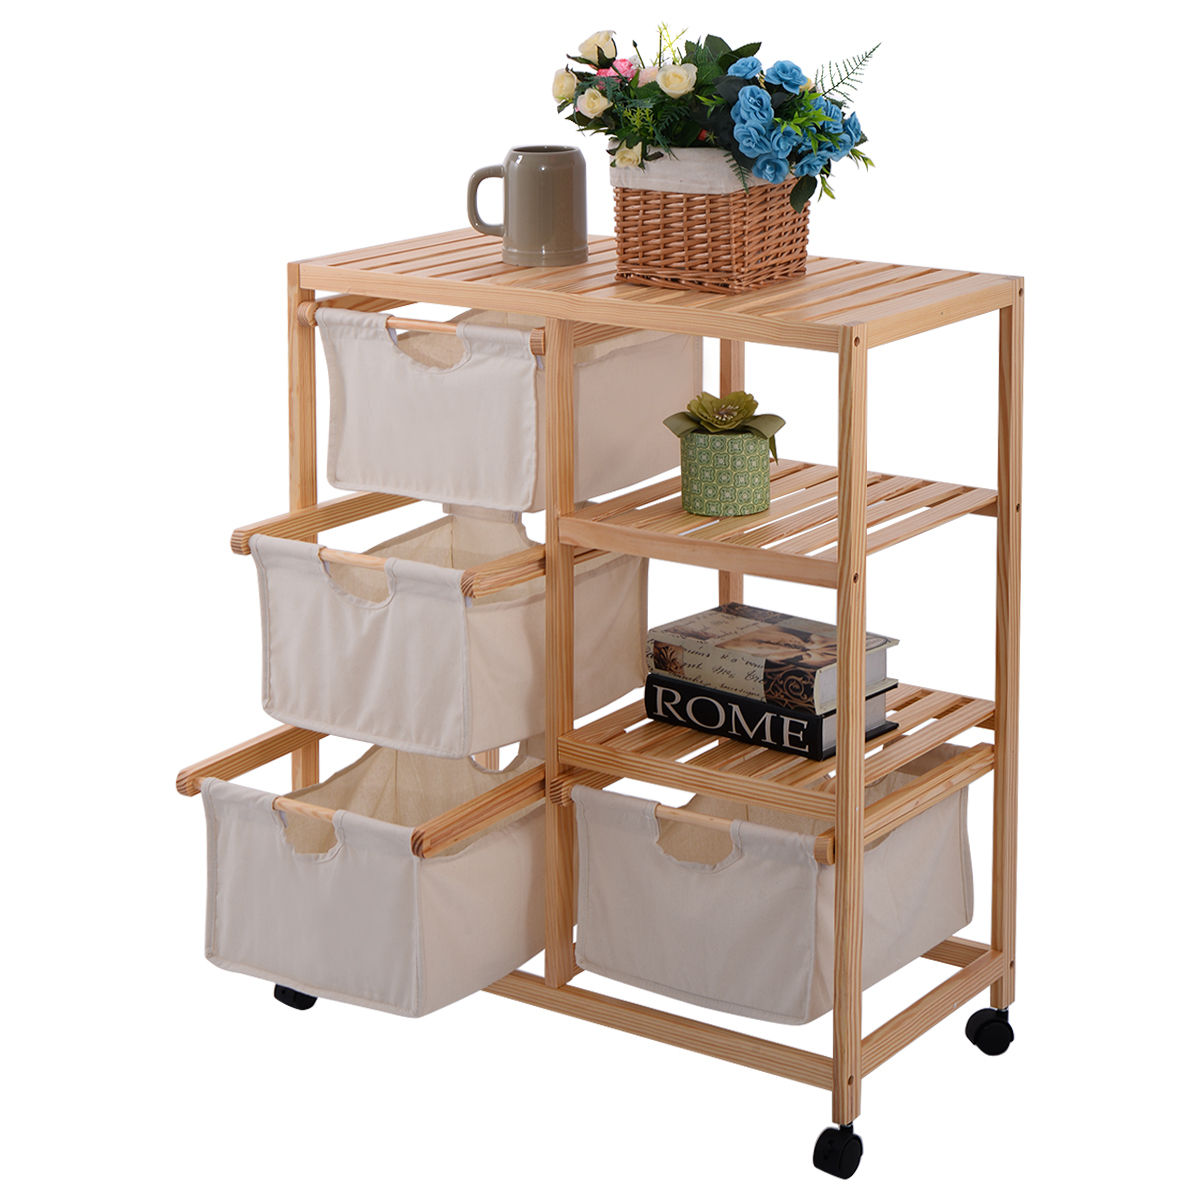 Wood Hamper 2 Section Storage Shelf Unit W/4 Fabric Drawers Home Furniture New